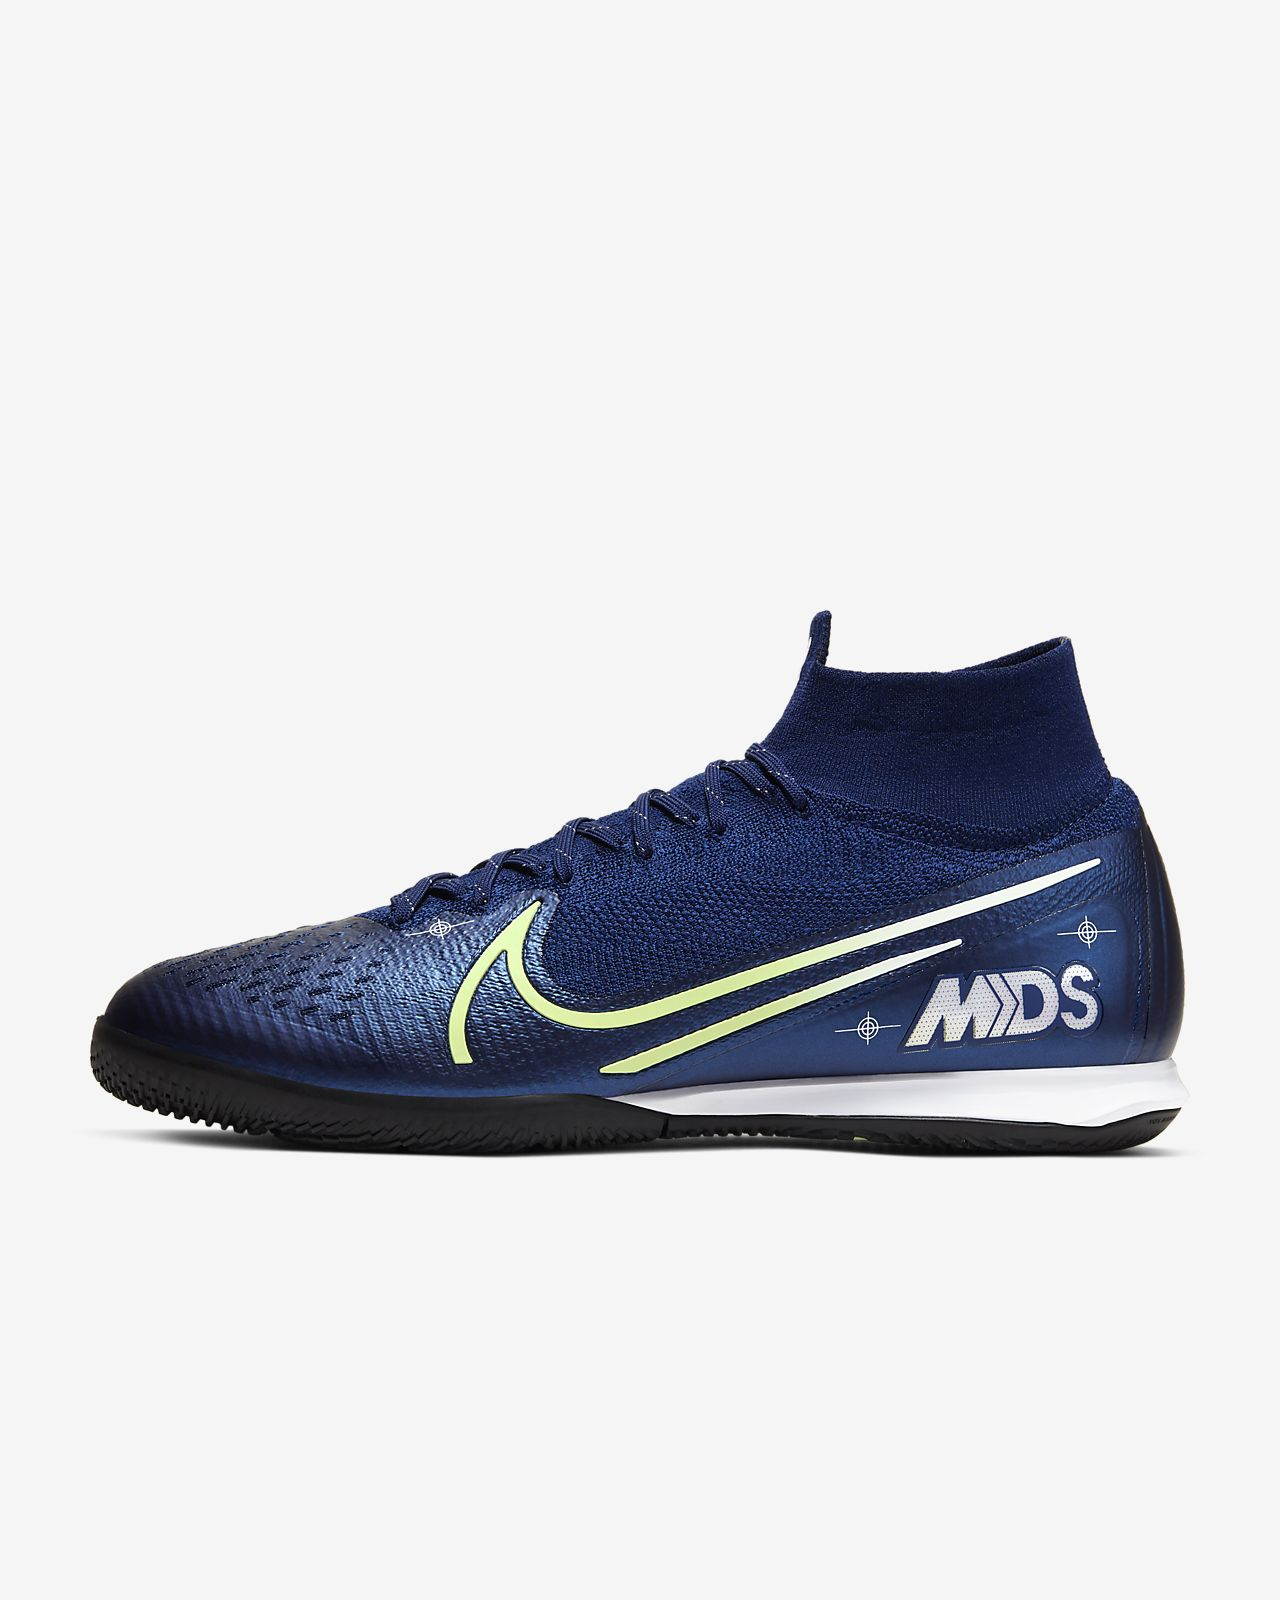 Nike Mercurial Superfly 7 Elite MDS IC Indoor/Court Soccer Shoe